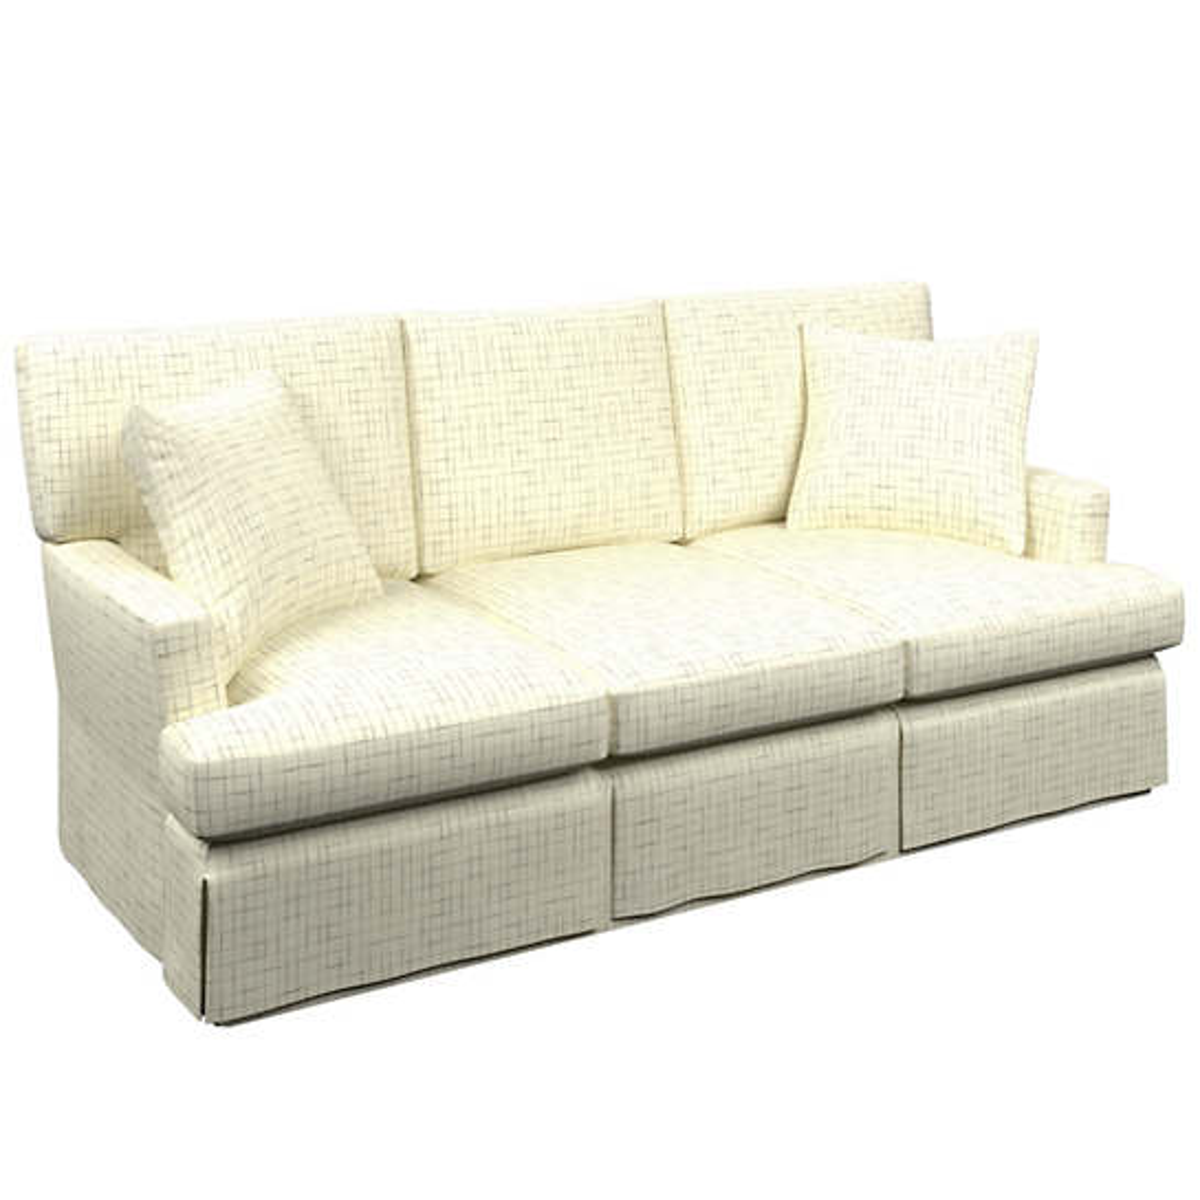 Nicholson Grey Saybrook 3 Seater Upholstered Sofa